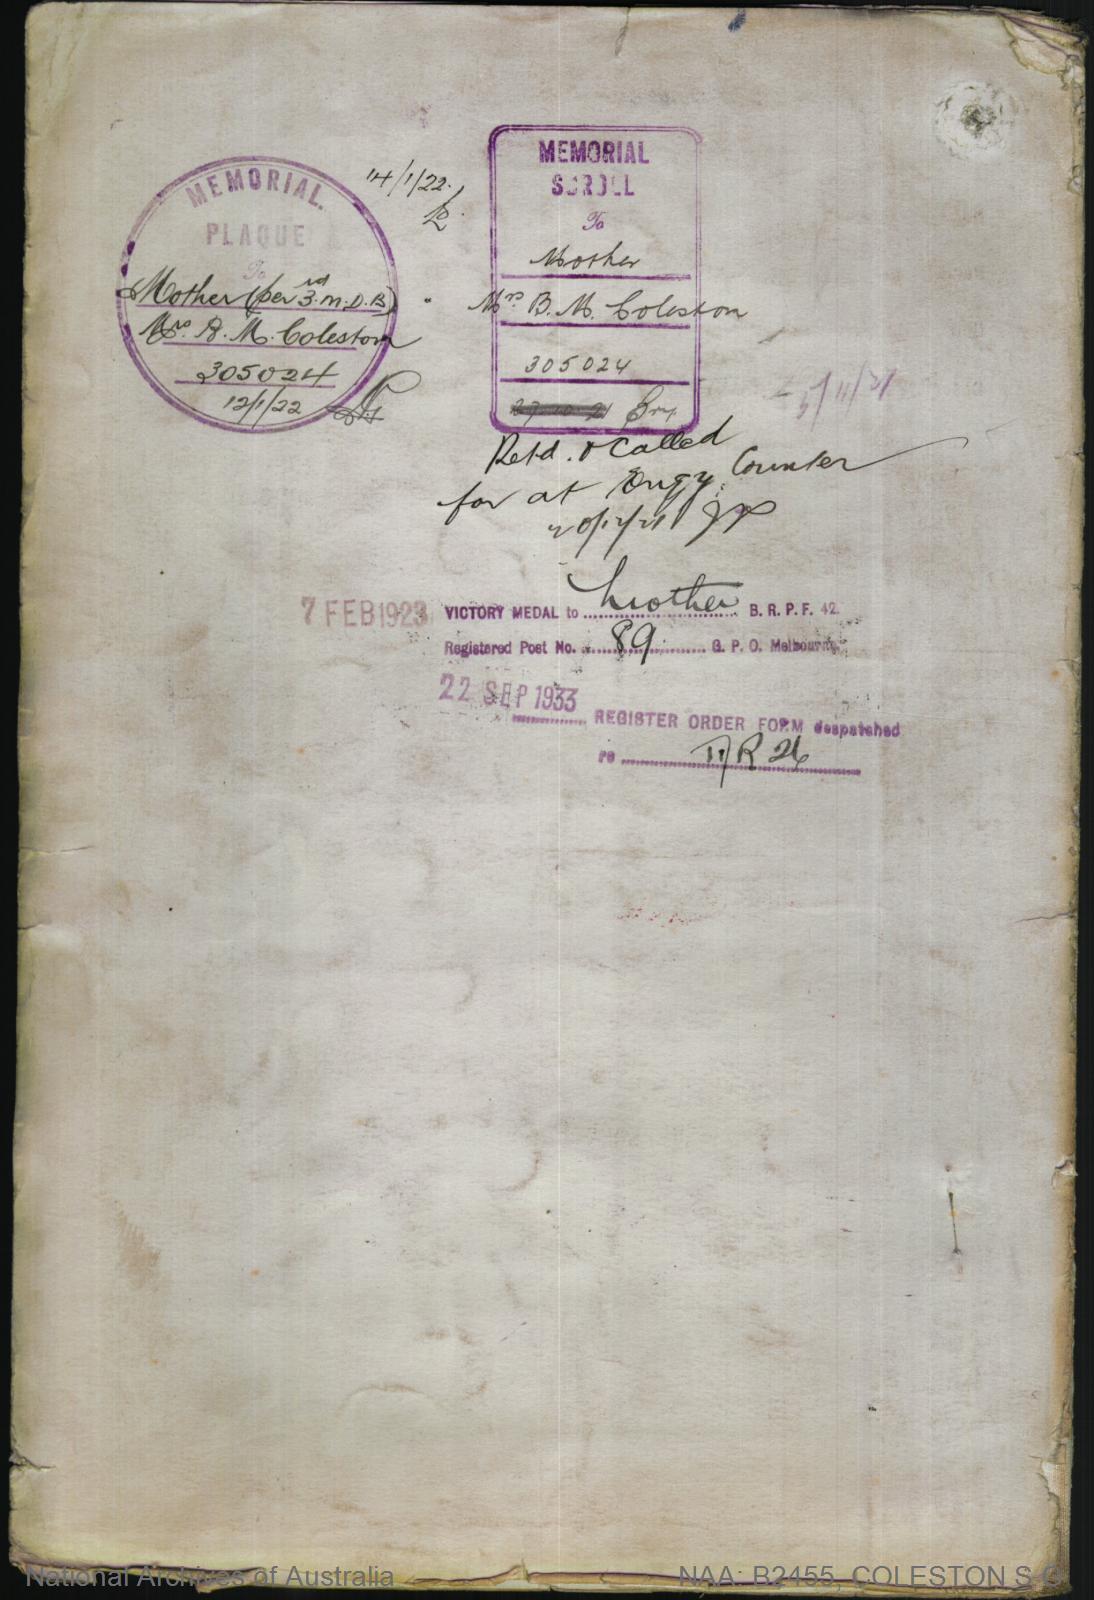 Coleston Stanley George : SERN 3039 : POB Warrnambool VIC : POE Melbourne VIC : NOK M Coleston Bridget M